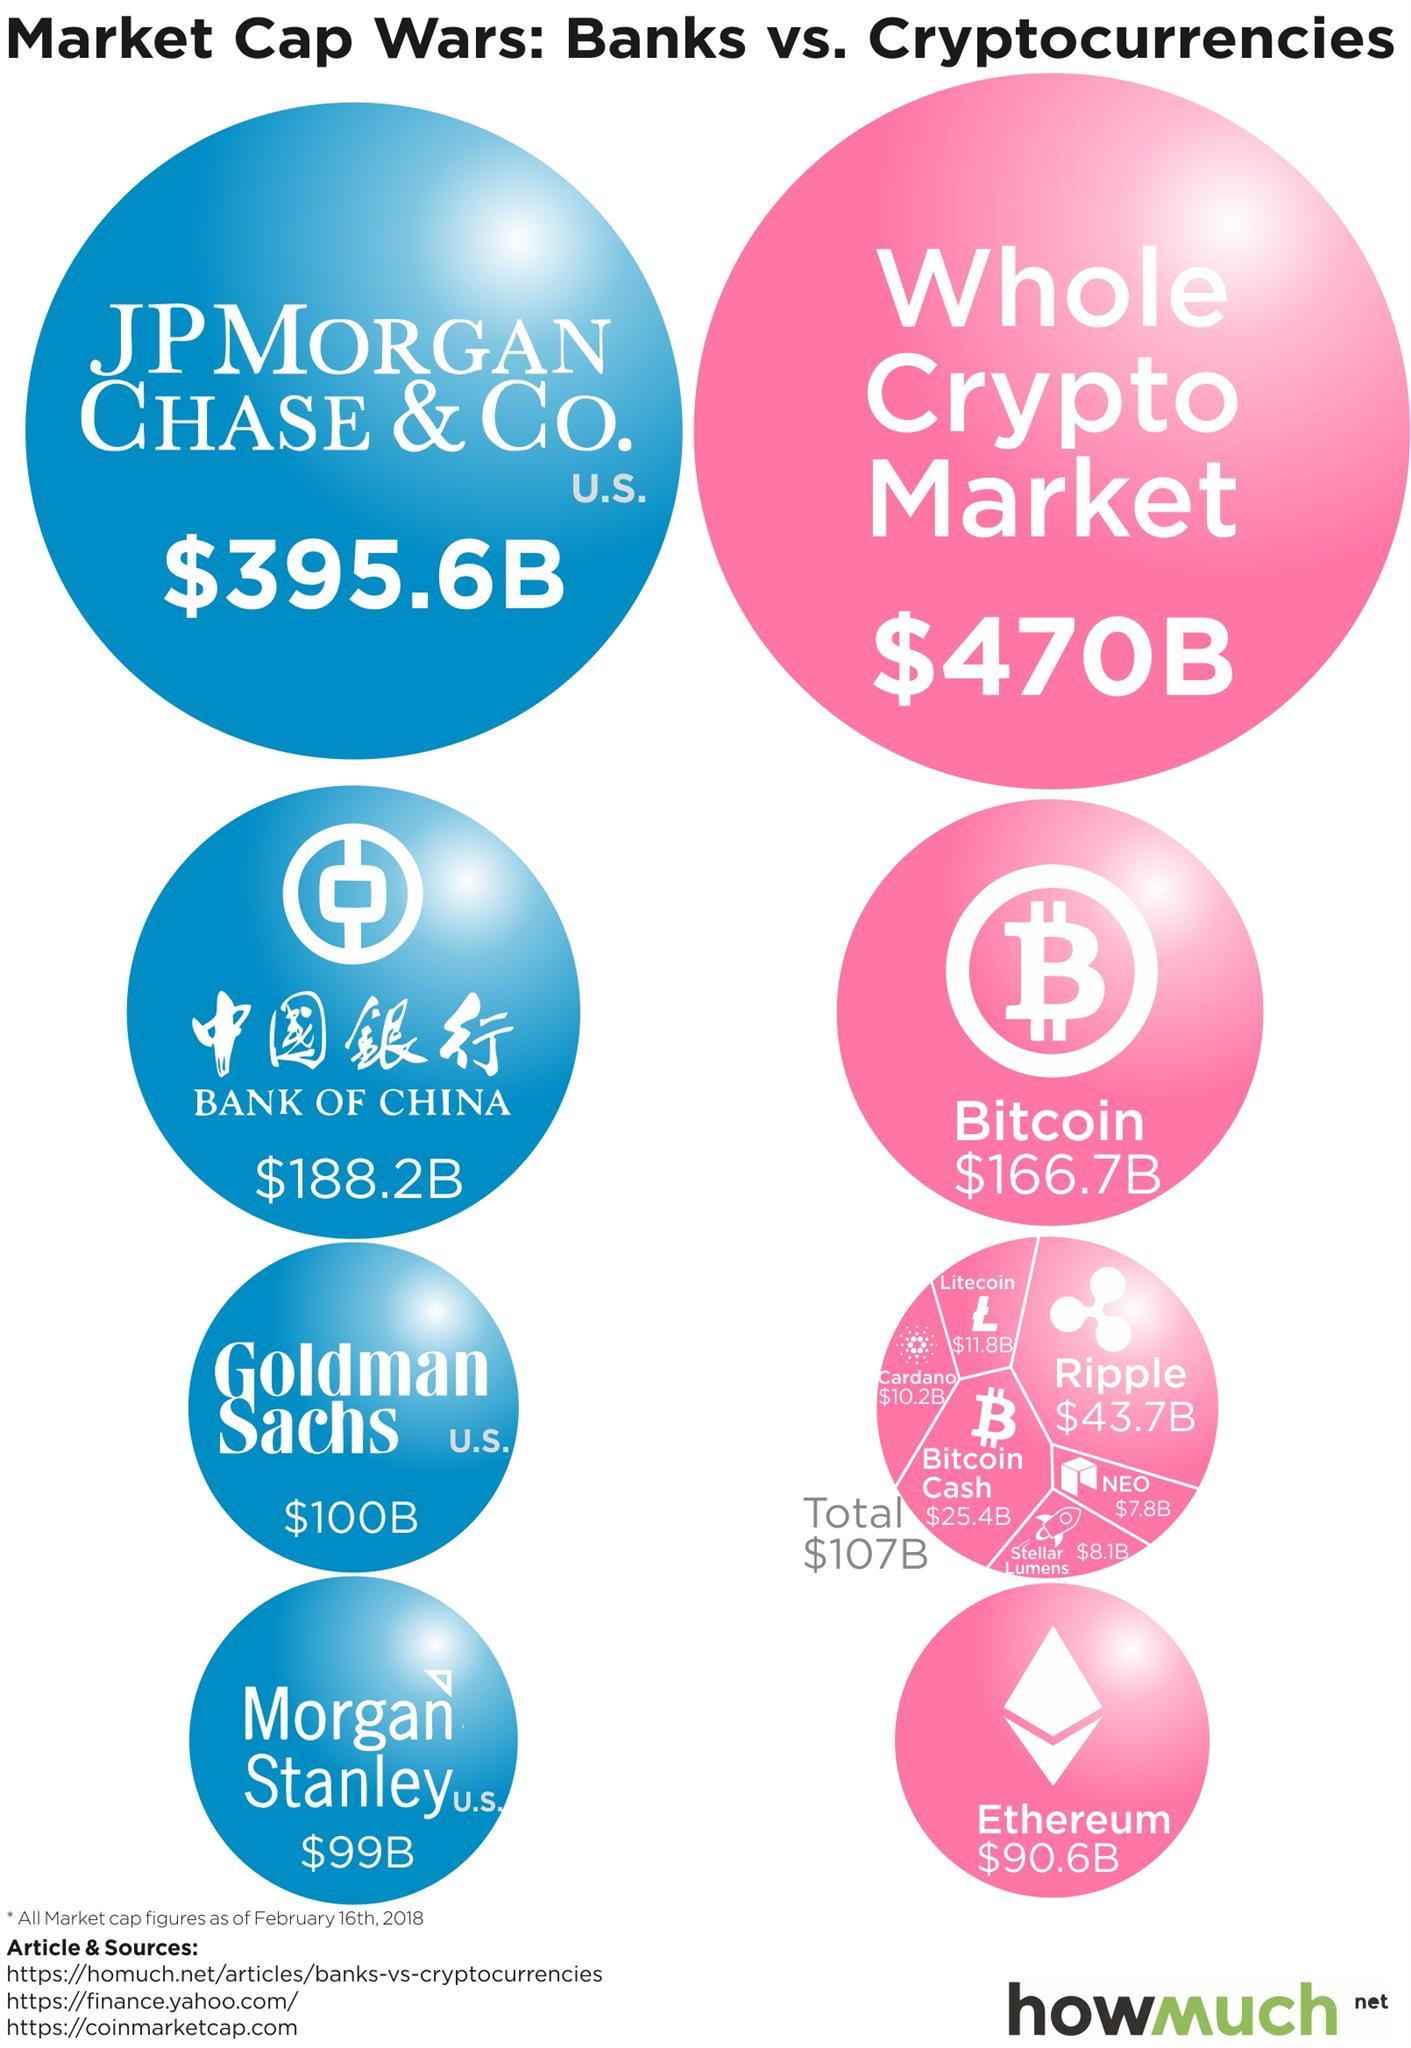 banks-vs-cryptos-f592[1]